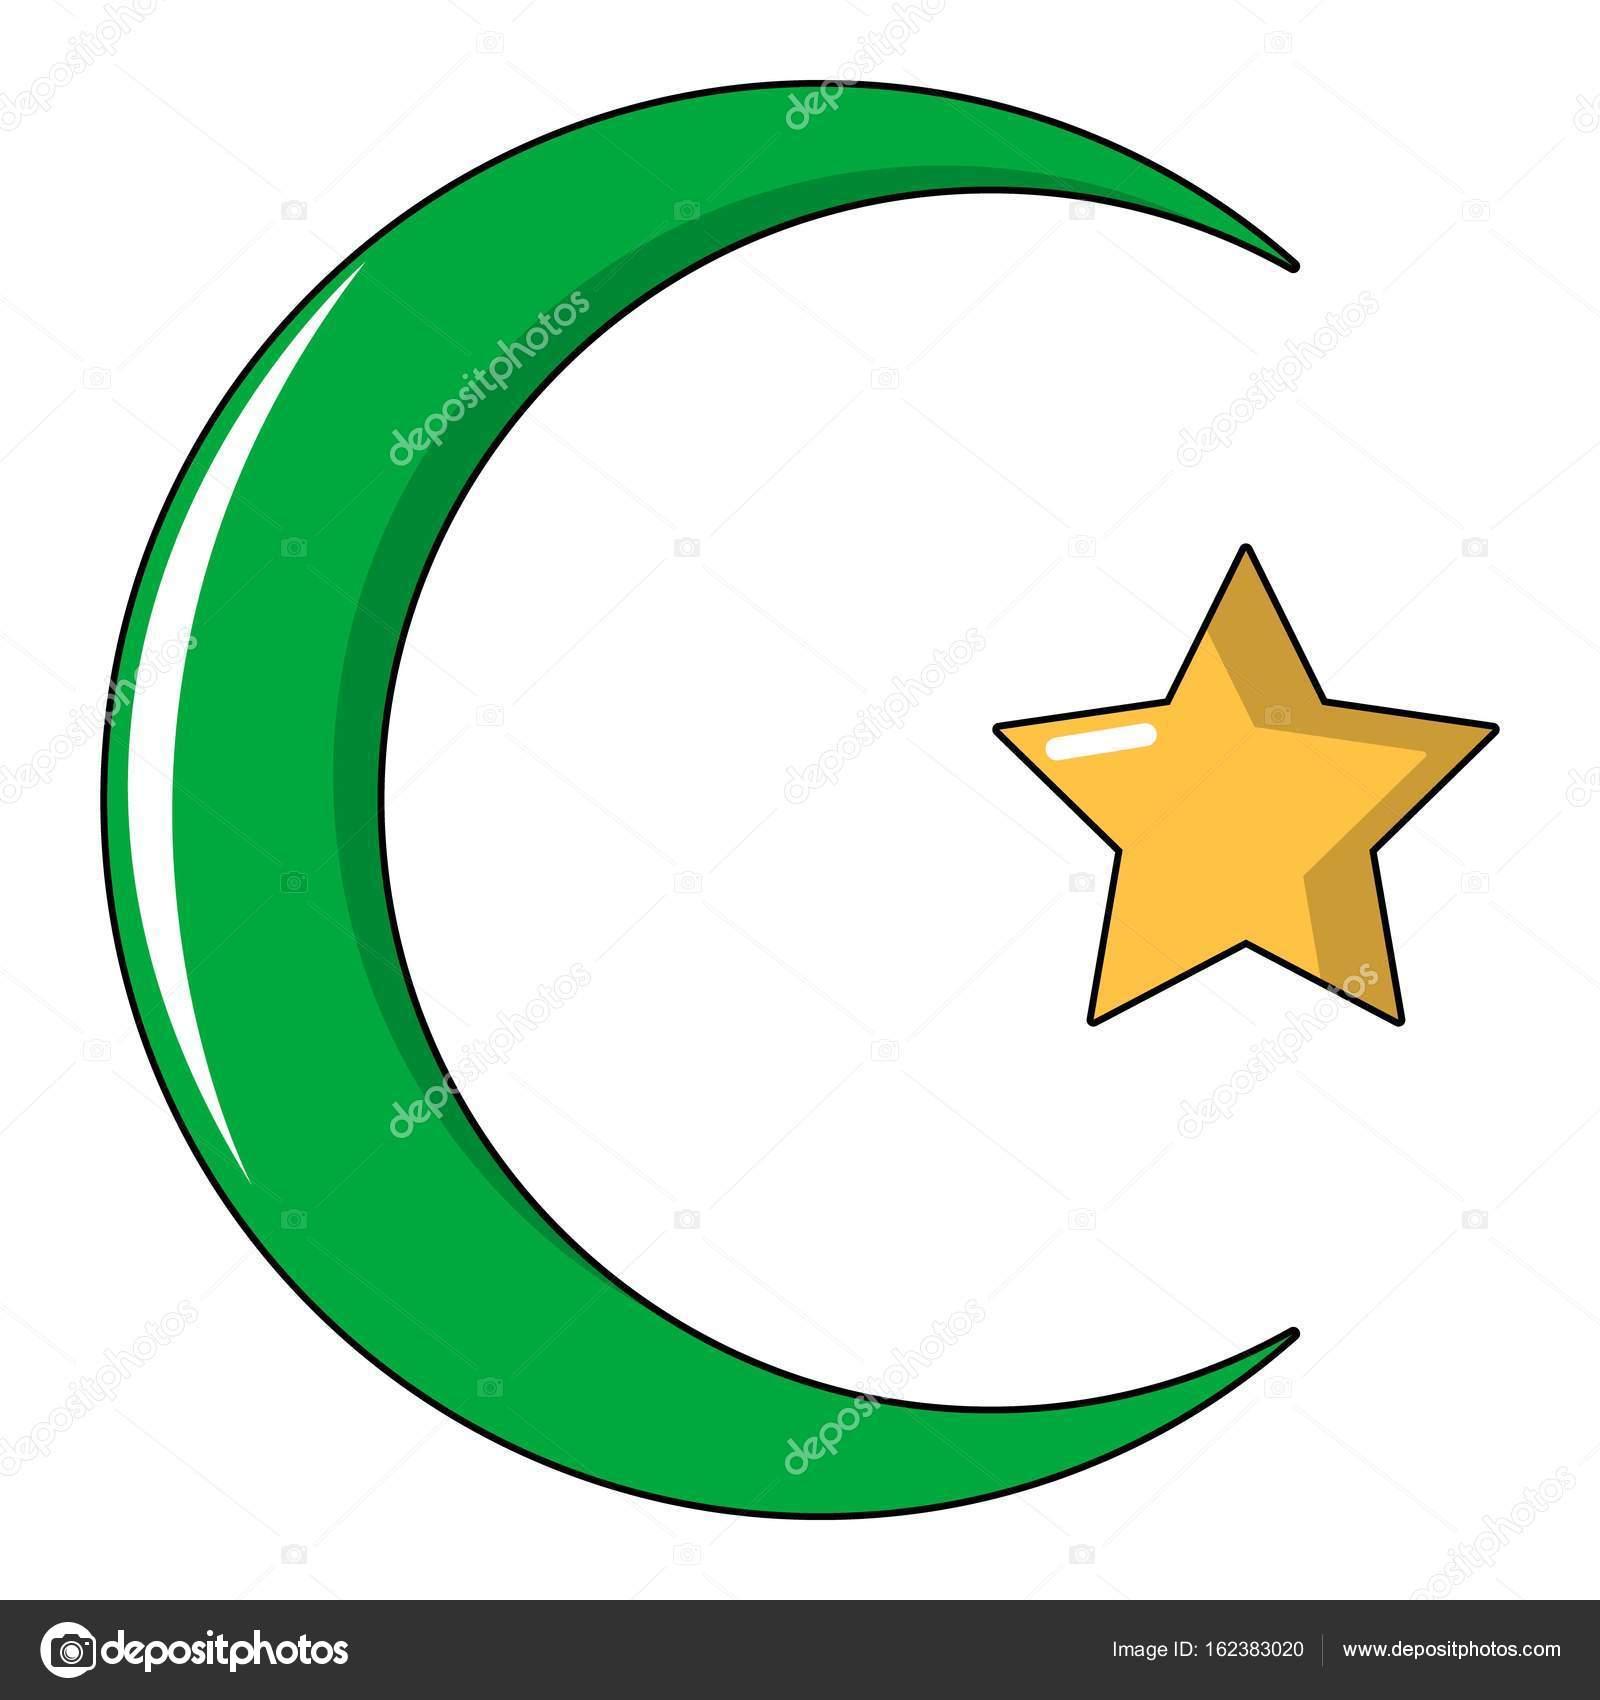 Starcrescent symbol of islam icon cartoon style stock vector starcrescent symbol of islam icon cartoon style stock vector buycottarizona Gallery